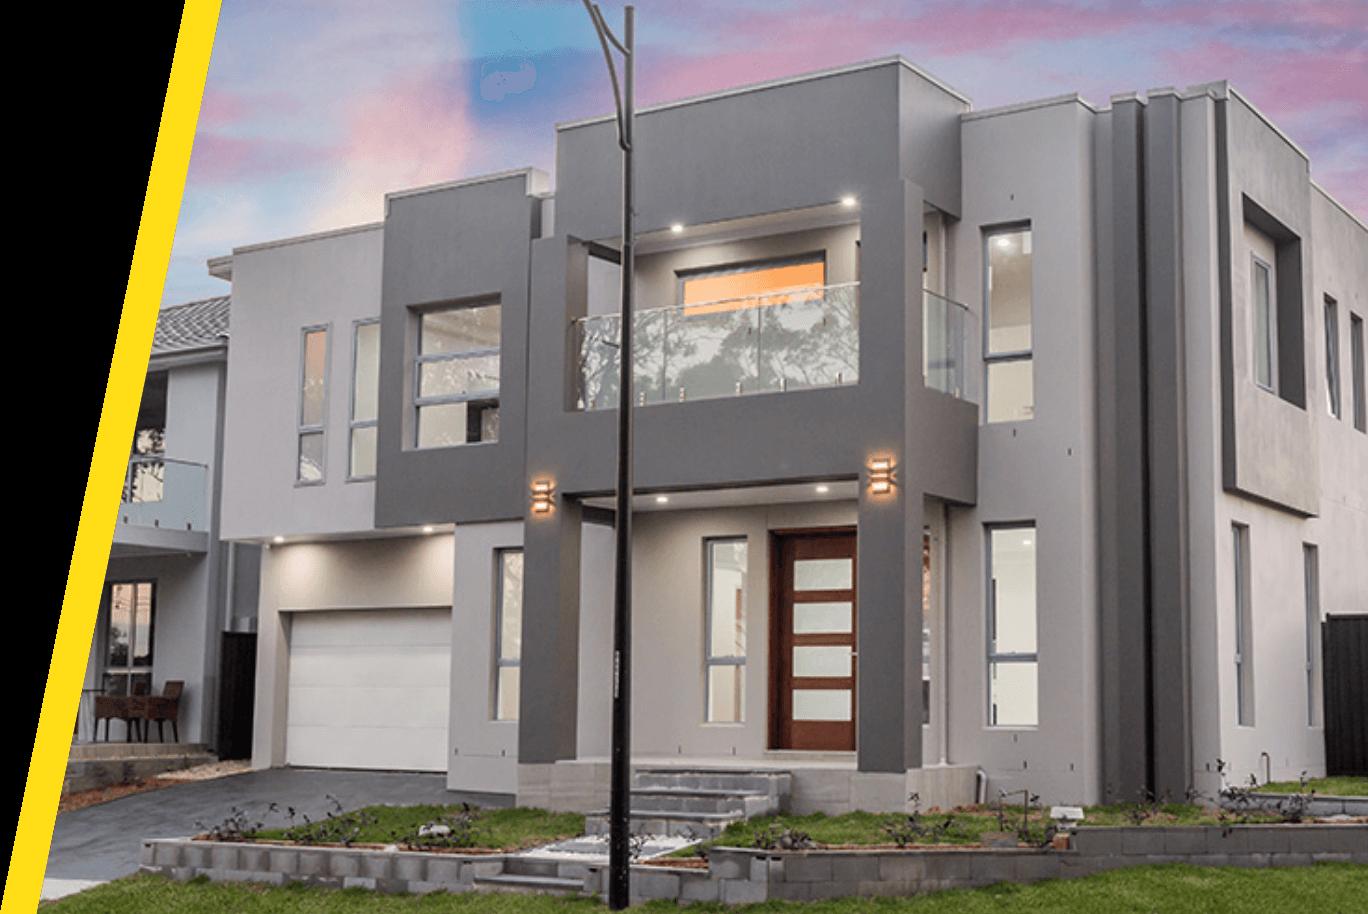 Dual Occupancy and Duplex